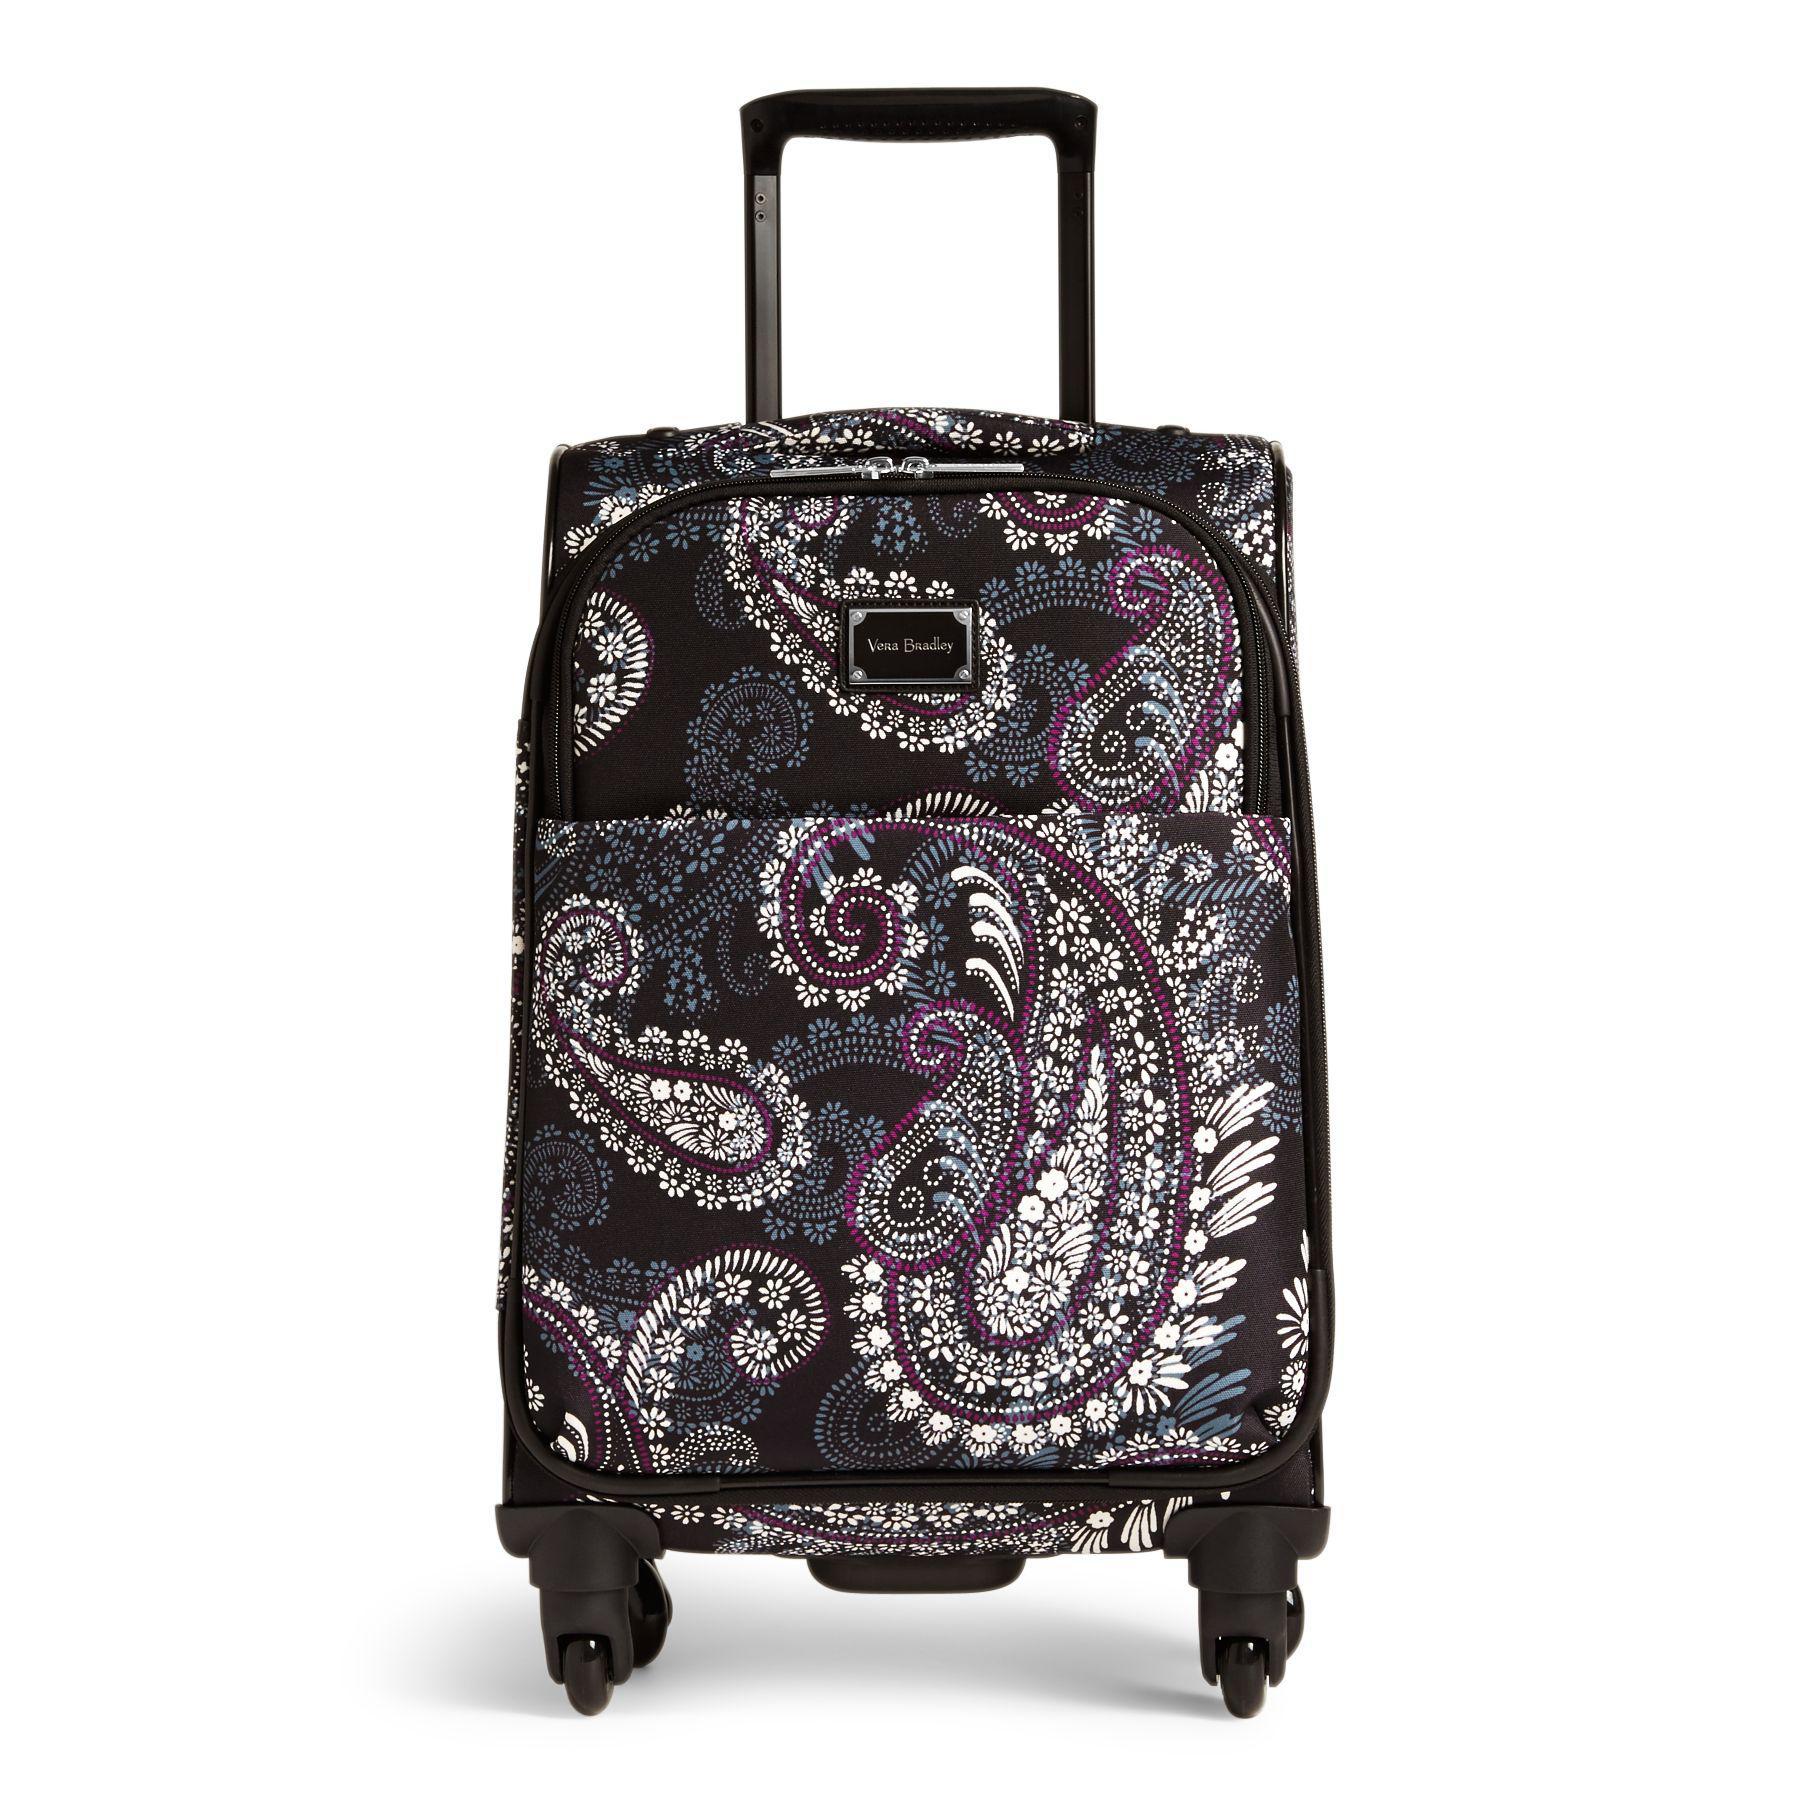 d5481c8e6830f Lyst - Vera Bradley Spinner Luggage Set in Black